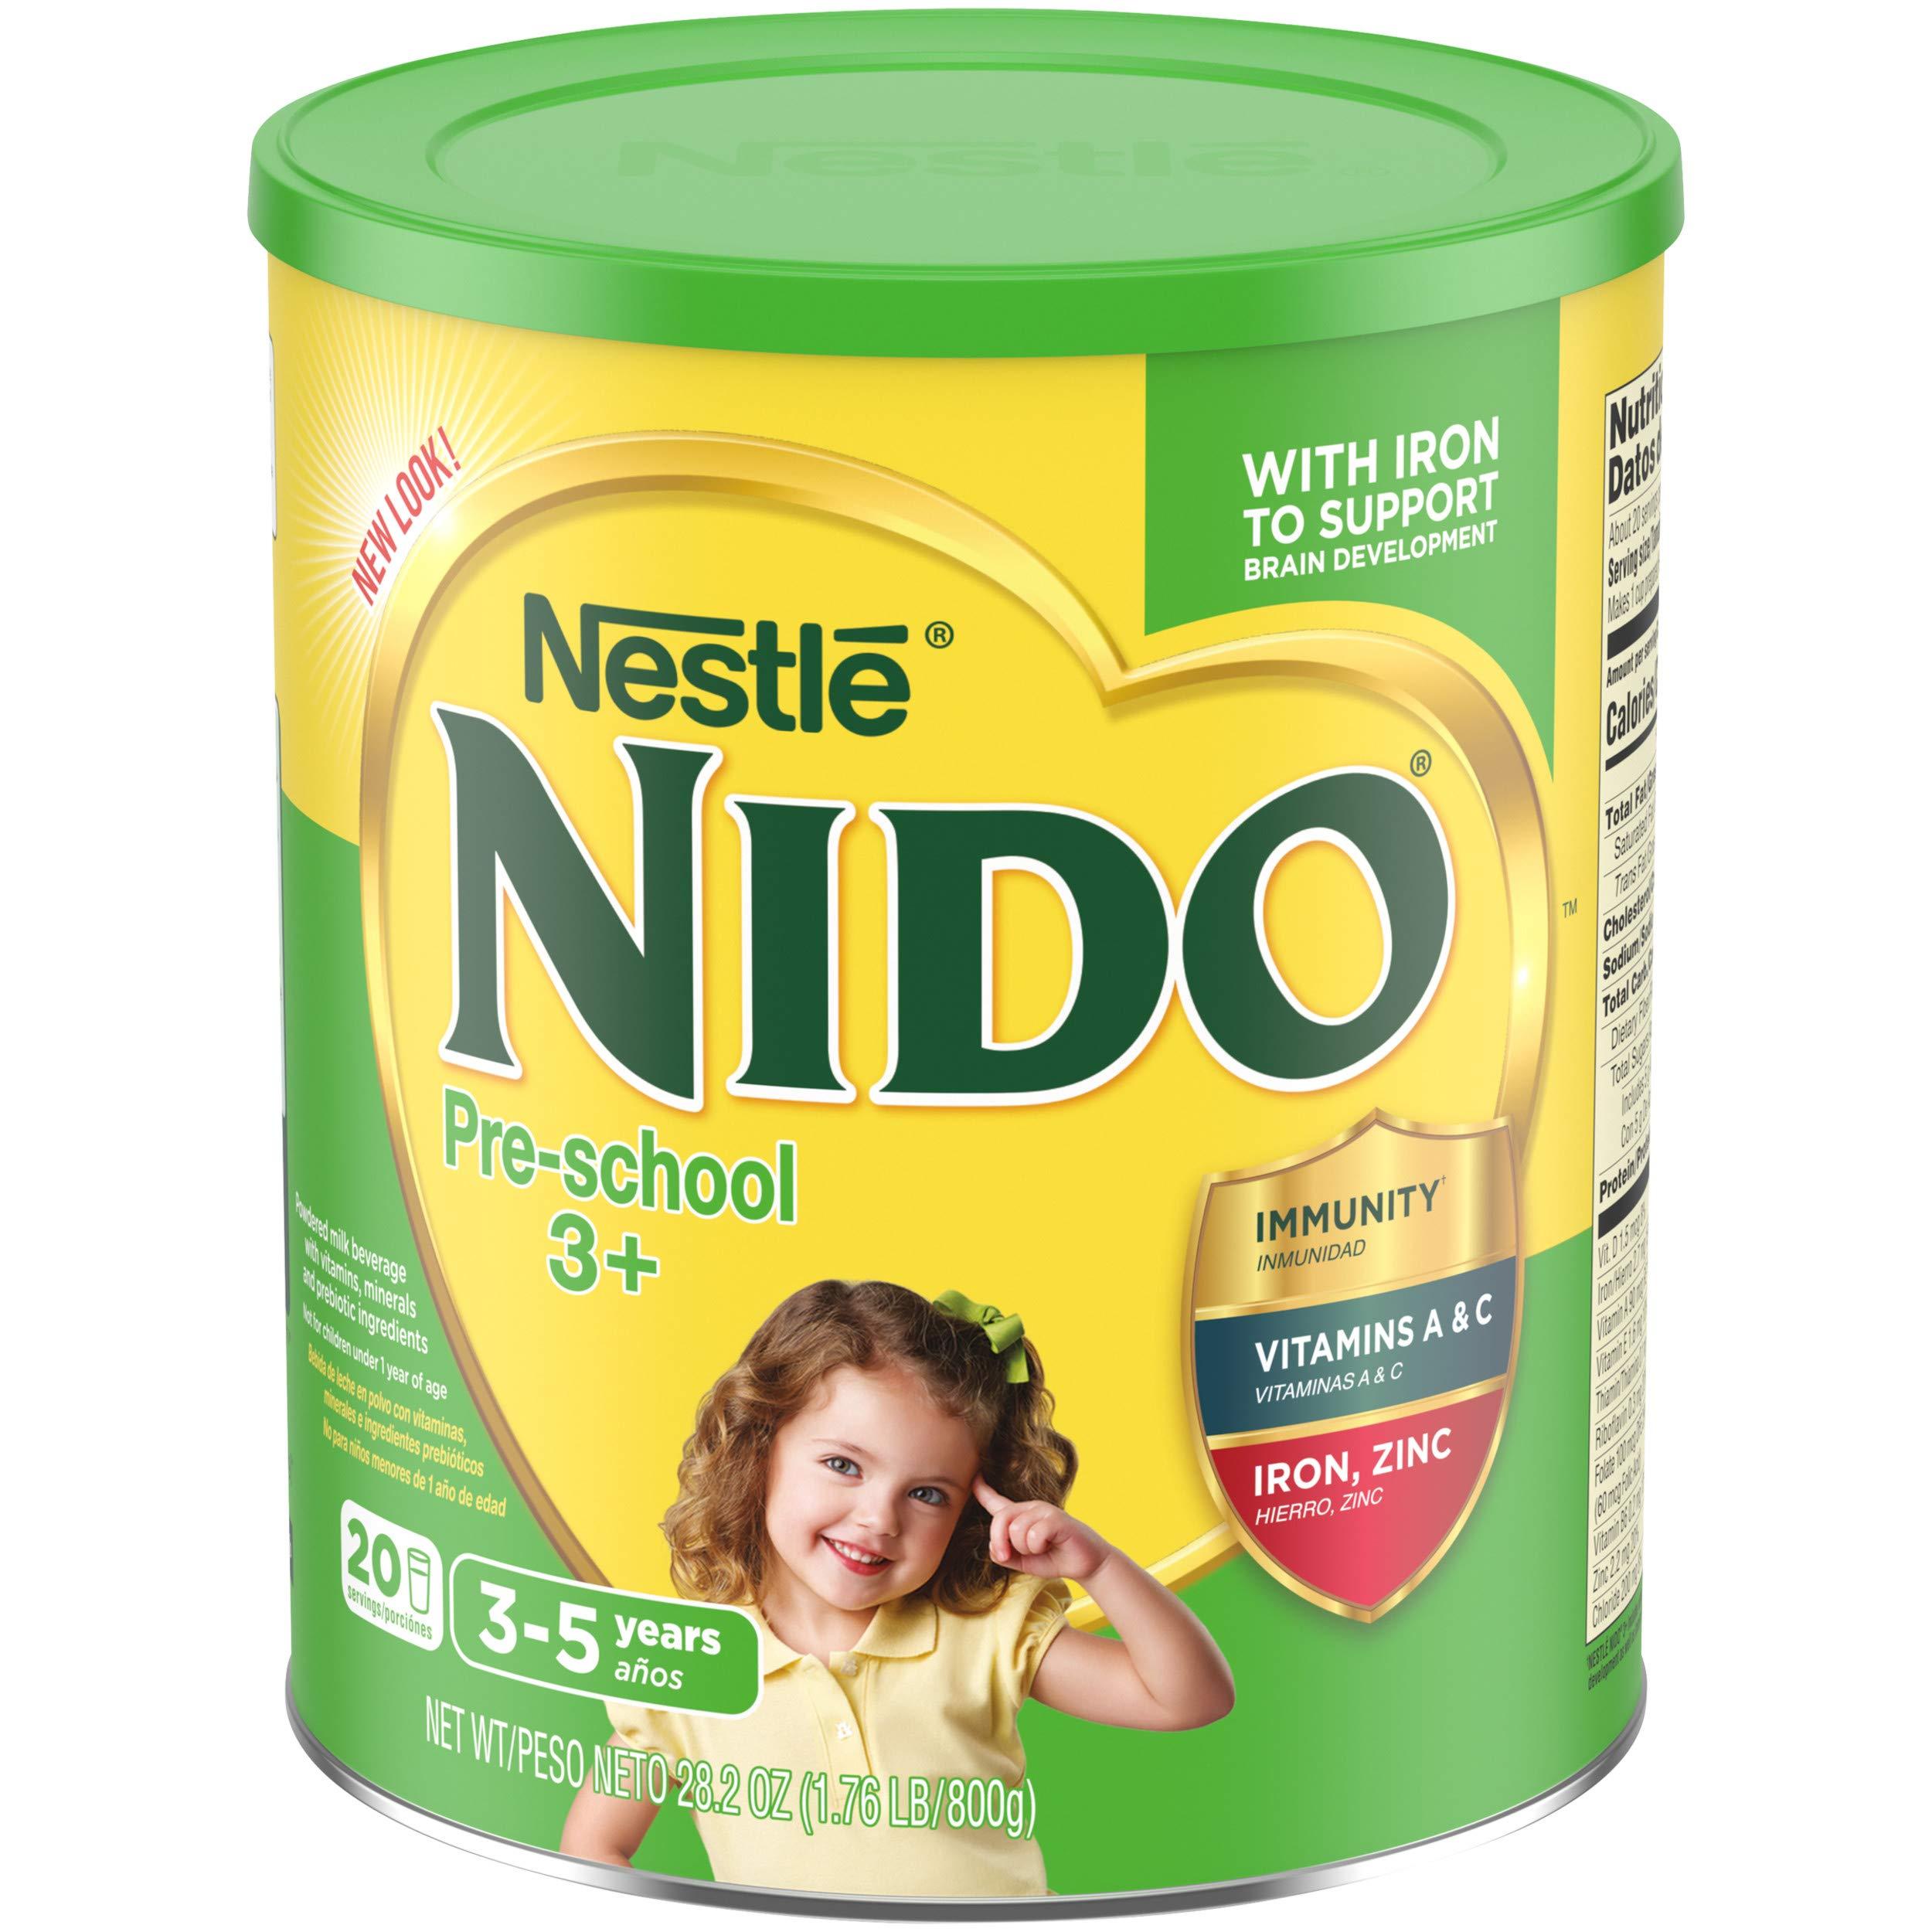 Nestle NIDO Pre-School 3+ Whole Milk Powder 1.76 lb. Canister | Powdered Milk Mix